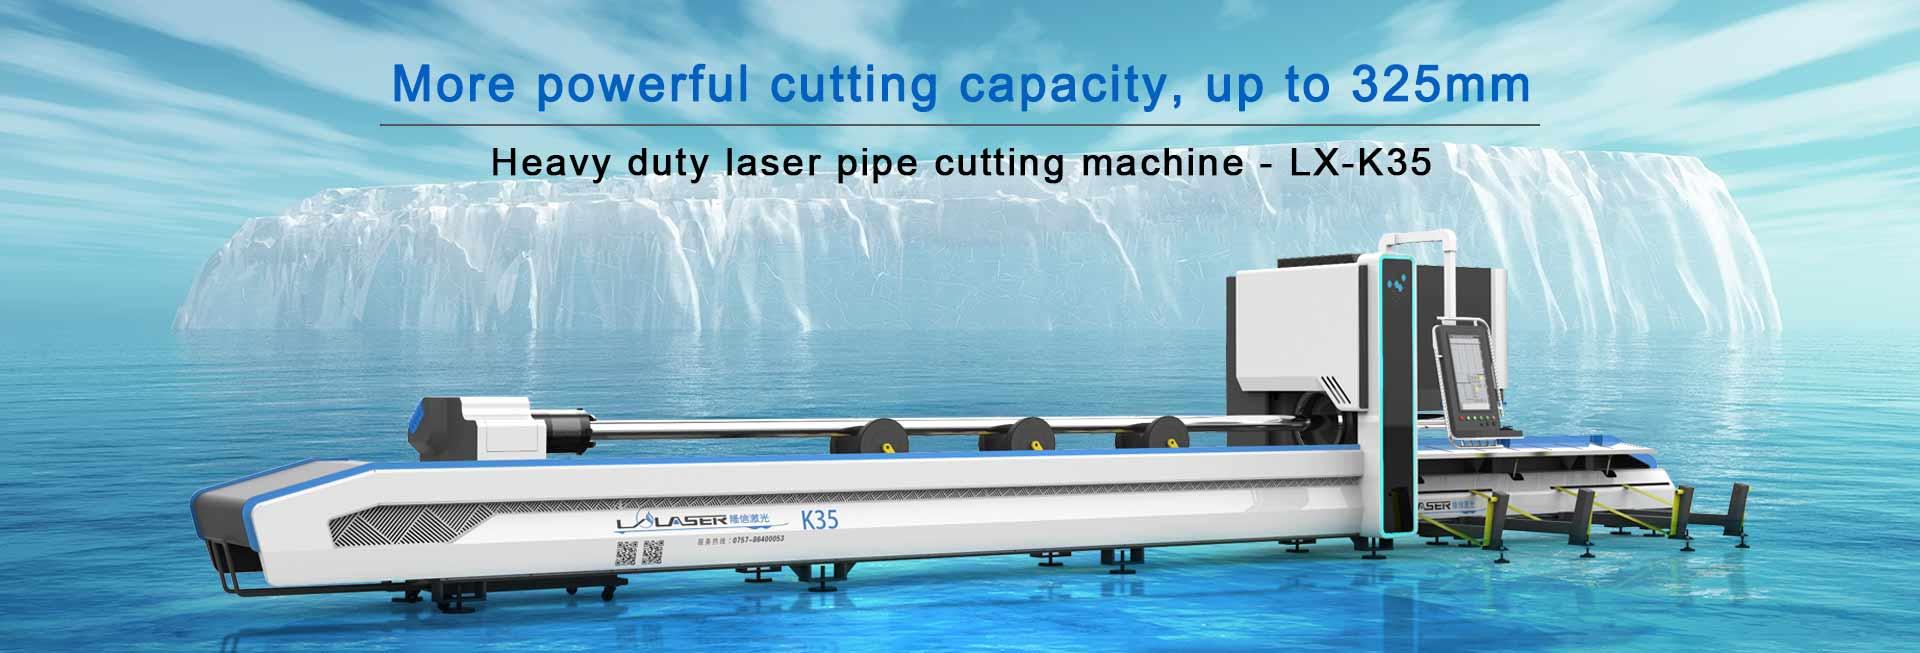 Heavy duty laser pipe cutting machine LX-K35